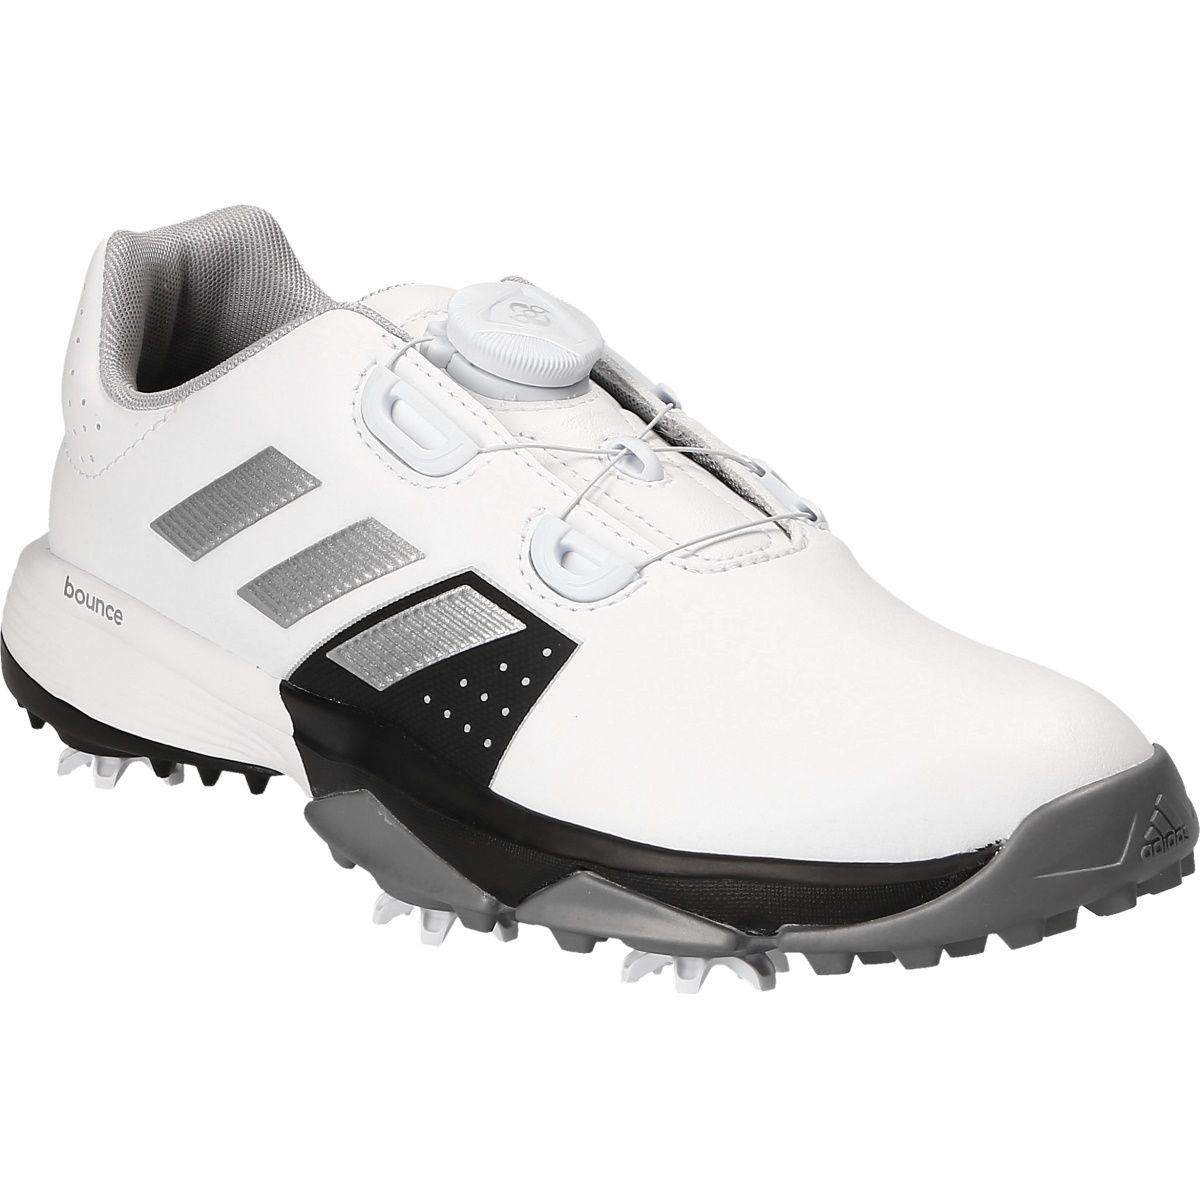 adidas golf f33535 kinderschuhe schn rschuhe im schuhe l ke online shop kaufen. Black Bedroom Furniture Sets. Home Design Ideas